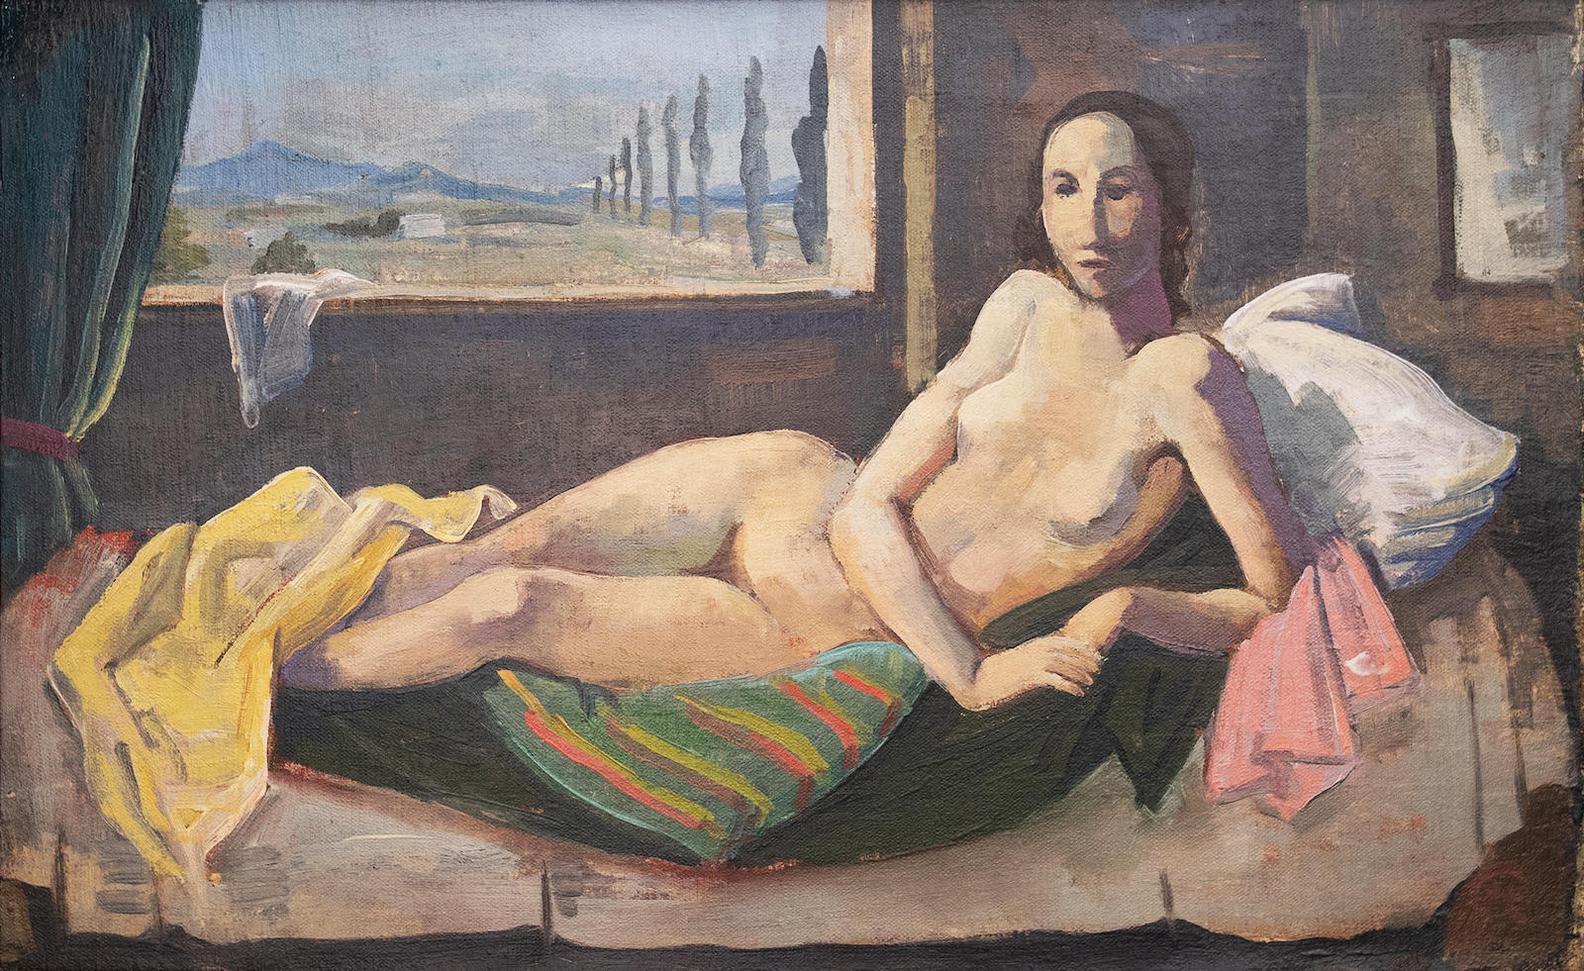 Karl Hofer-Liegender Madchenakt Vor Fenster Mit Berglandschaft-1940